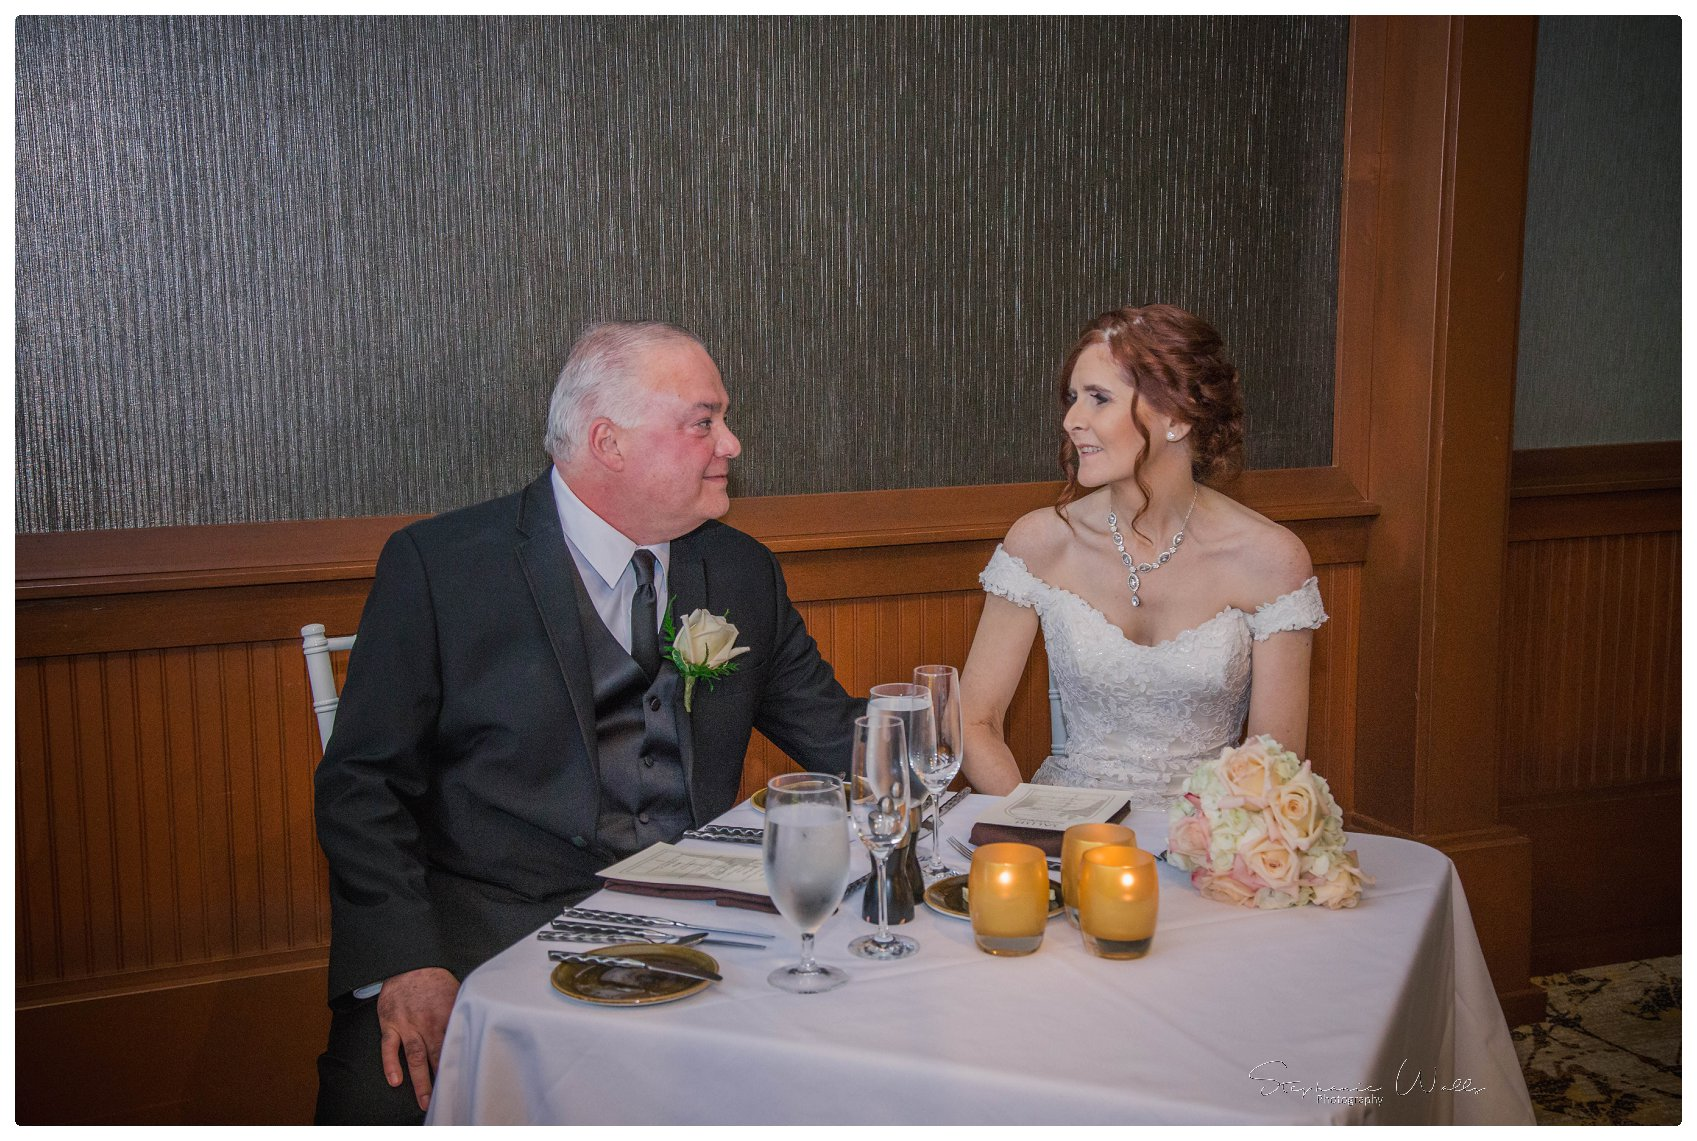 Portraits Ceremony 184 Salish Lodge & Spa    Elopement With Liz and Paul